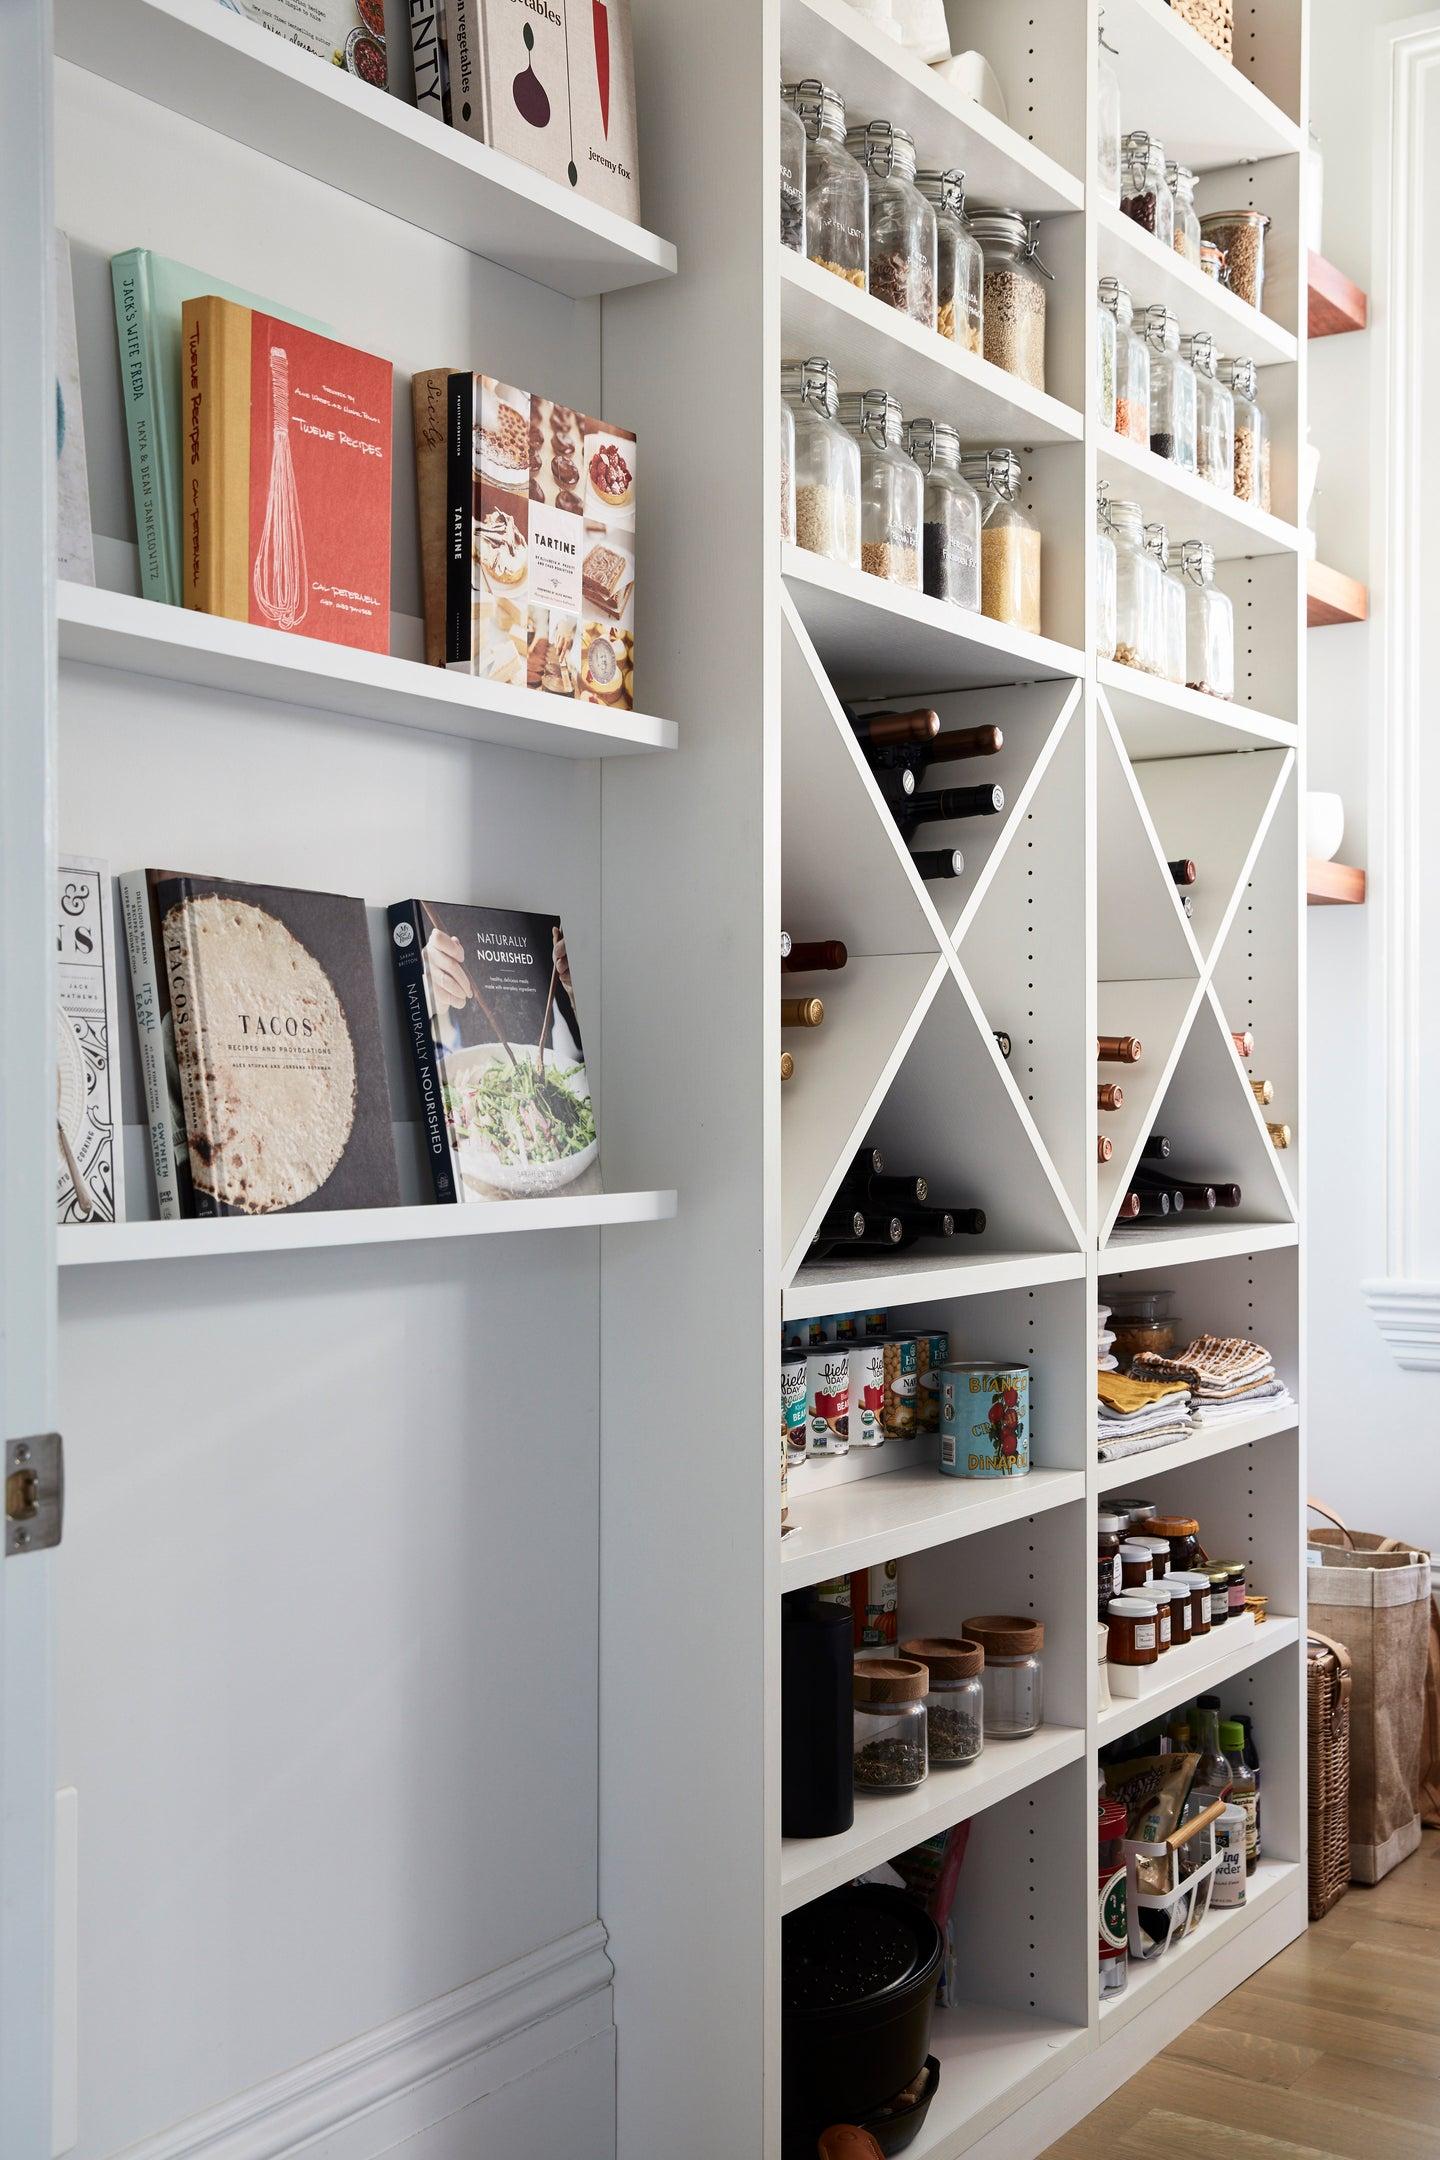 Kitchen pantry with wine storage